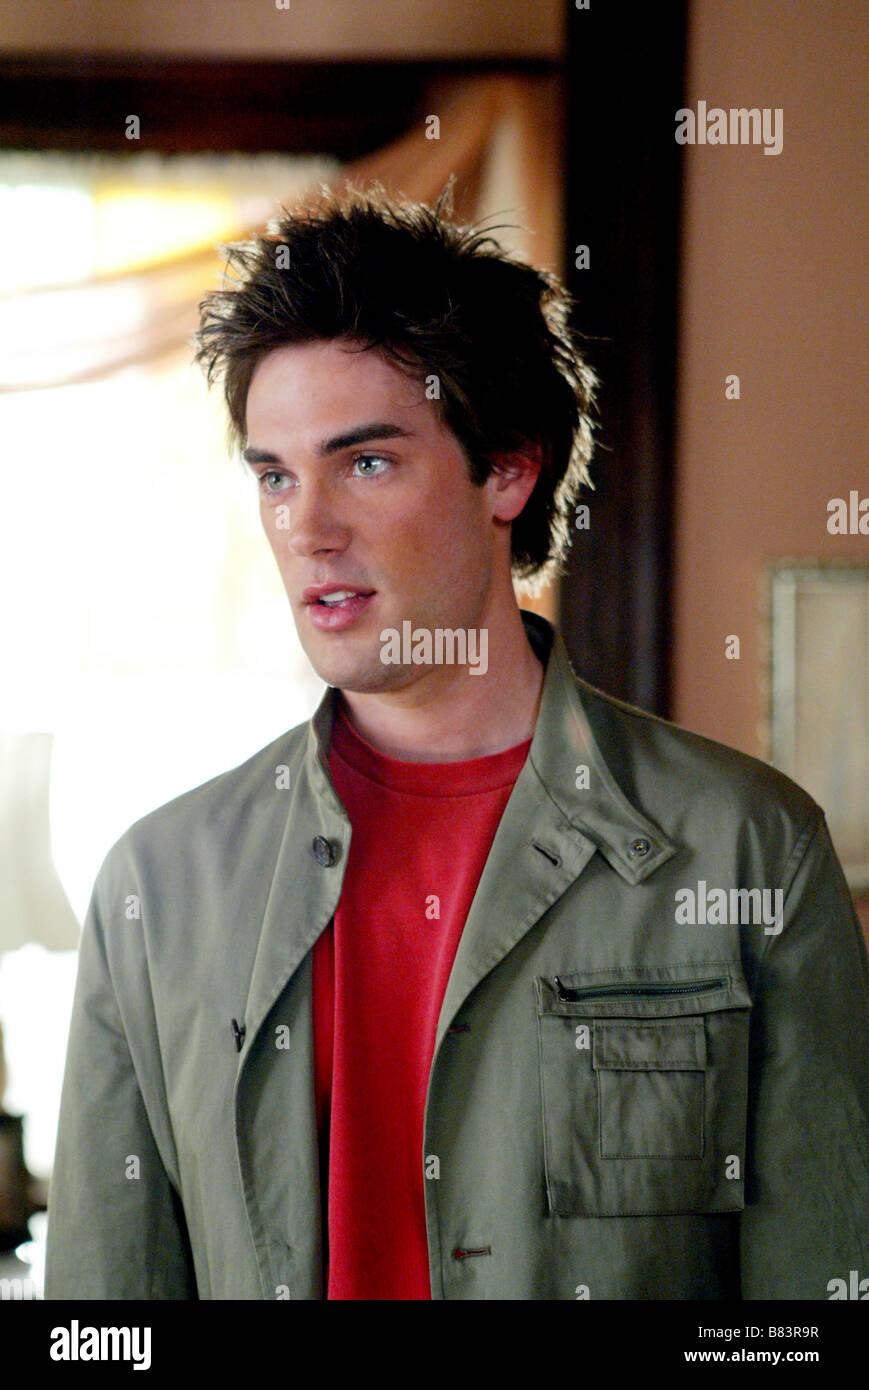 Charmed TV-Series 1998-2006 USA 2003 Season 5, episode 22+23